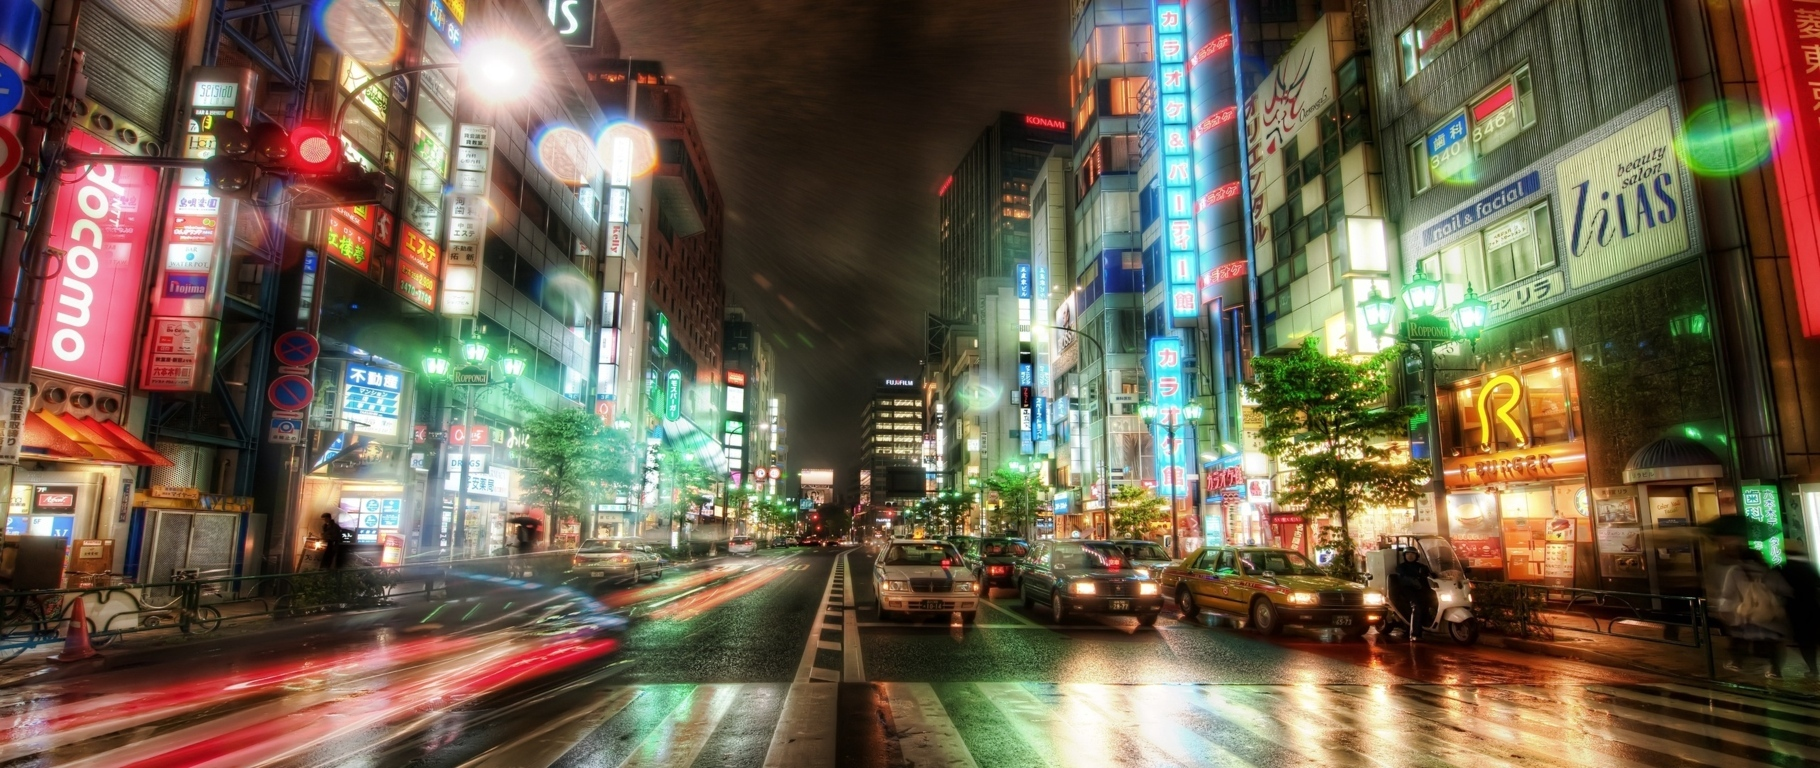 Tokyo Night 5k Hd 4k Wallpaper Image Background Photography